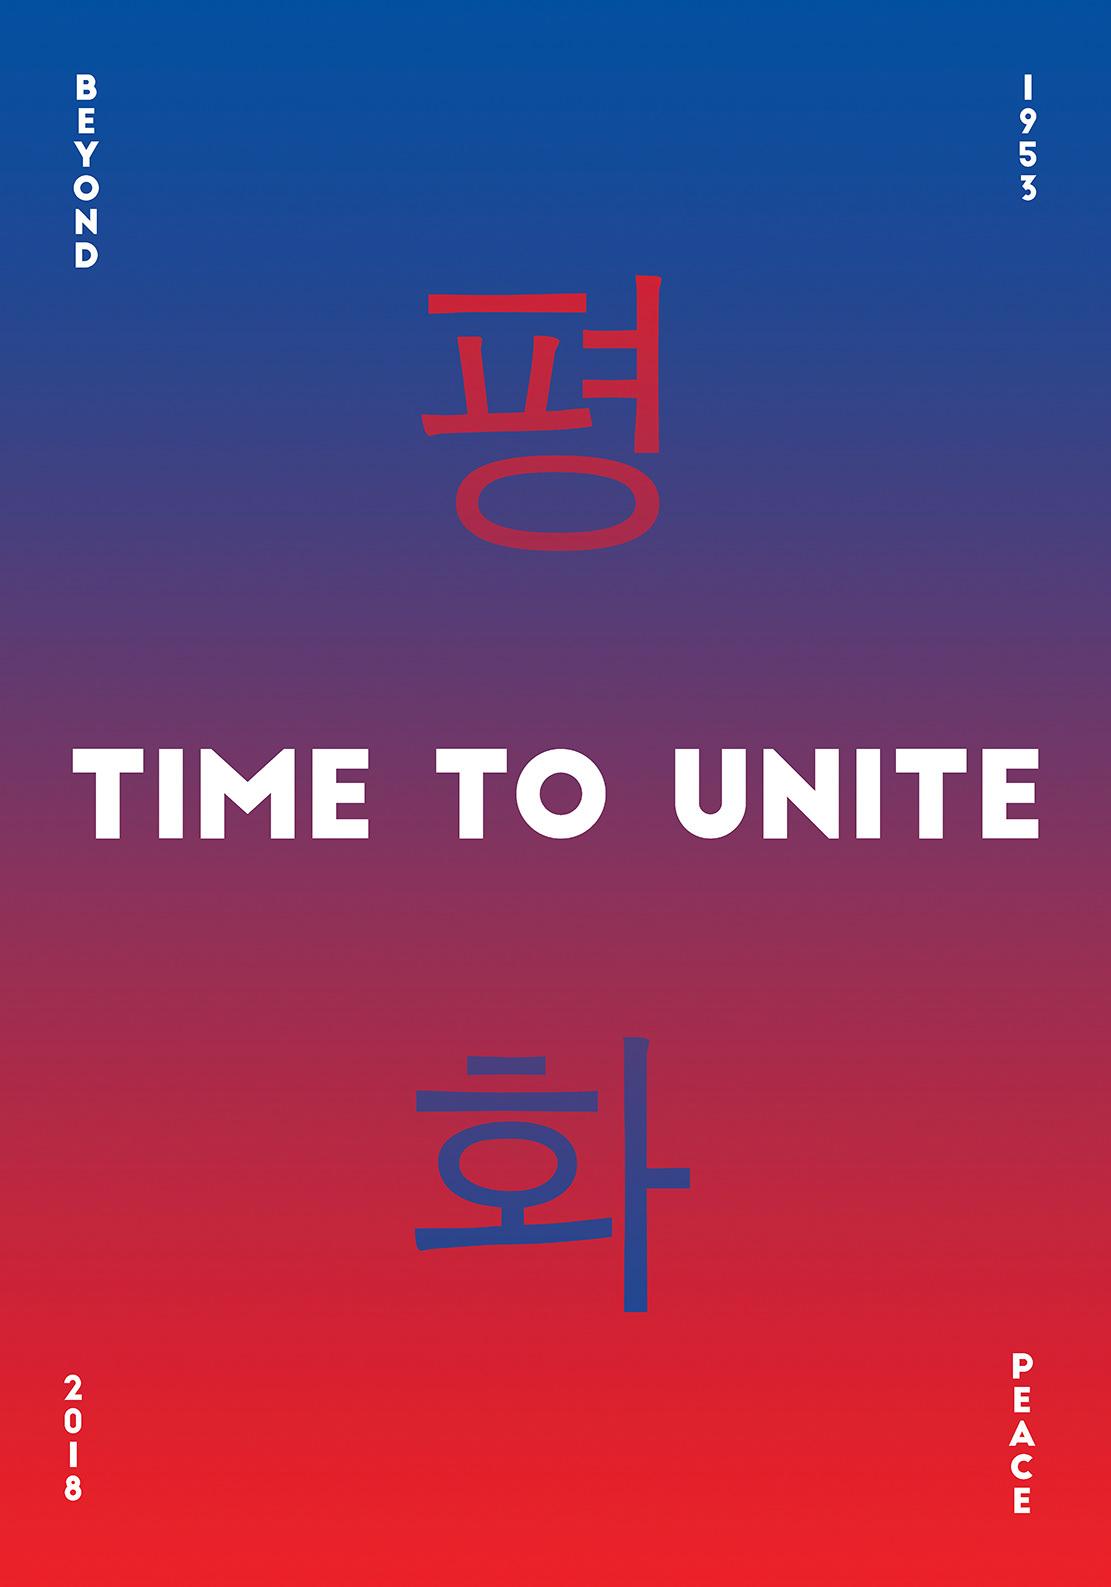 north korea South Korea Exhibition  poster graphic design  peace